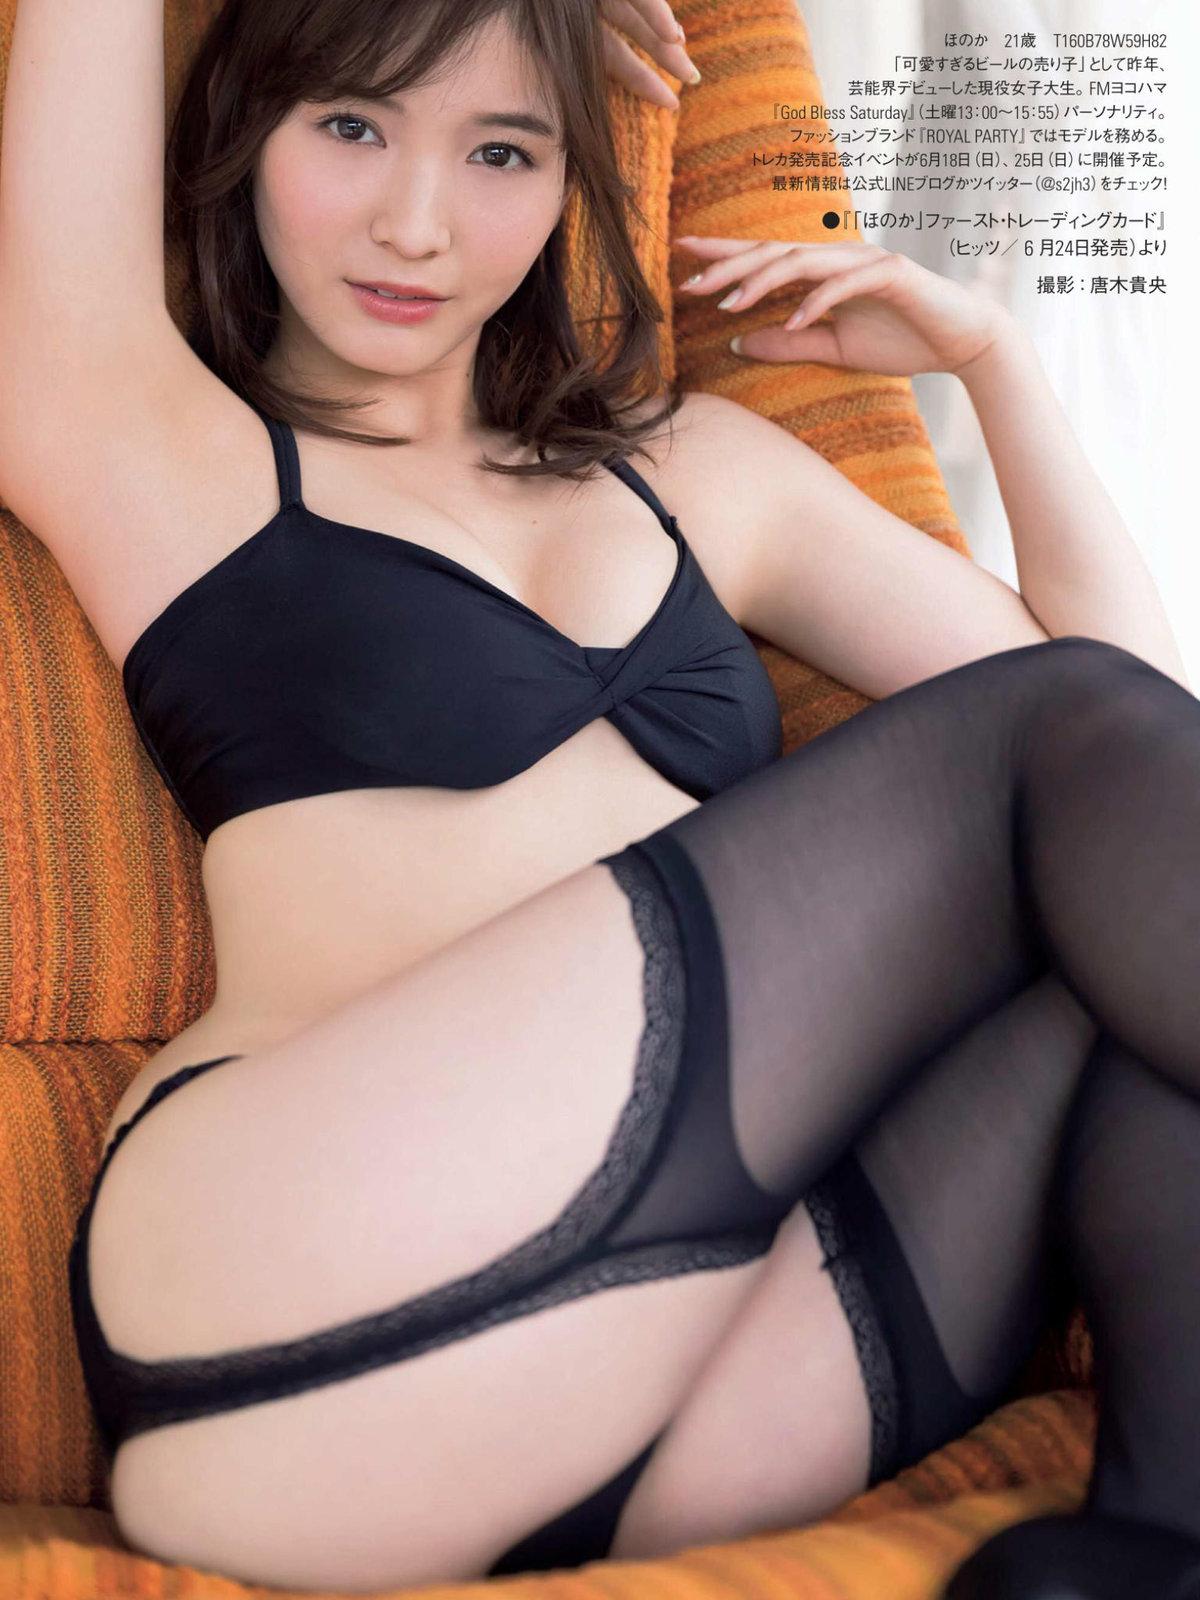 Honoka ほのか, FLASH 電子版 2017.11.14 (フラッシュ 2017年11月14日号)